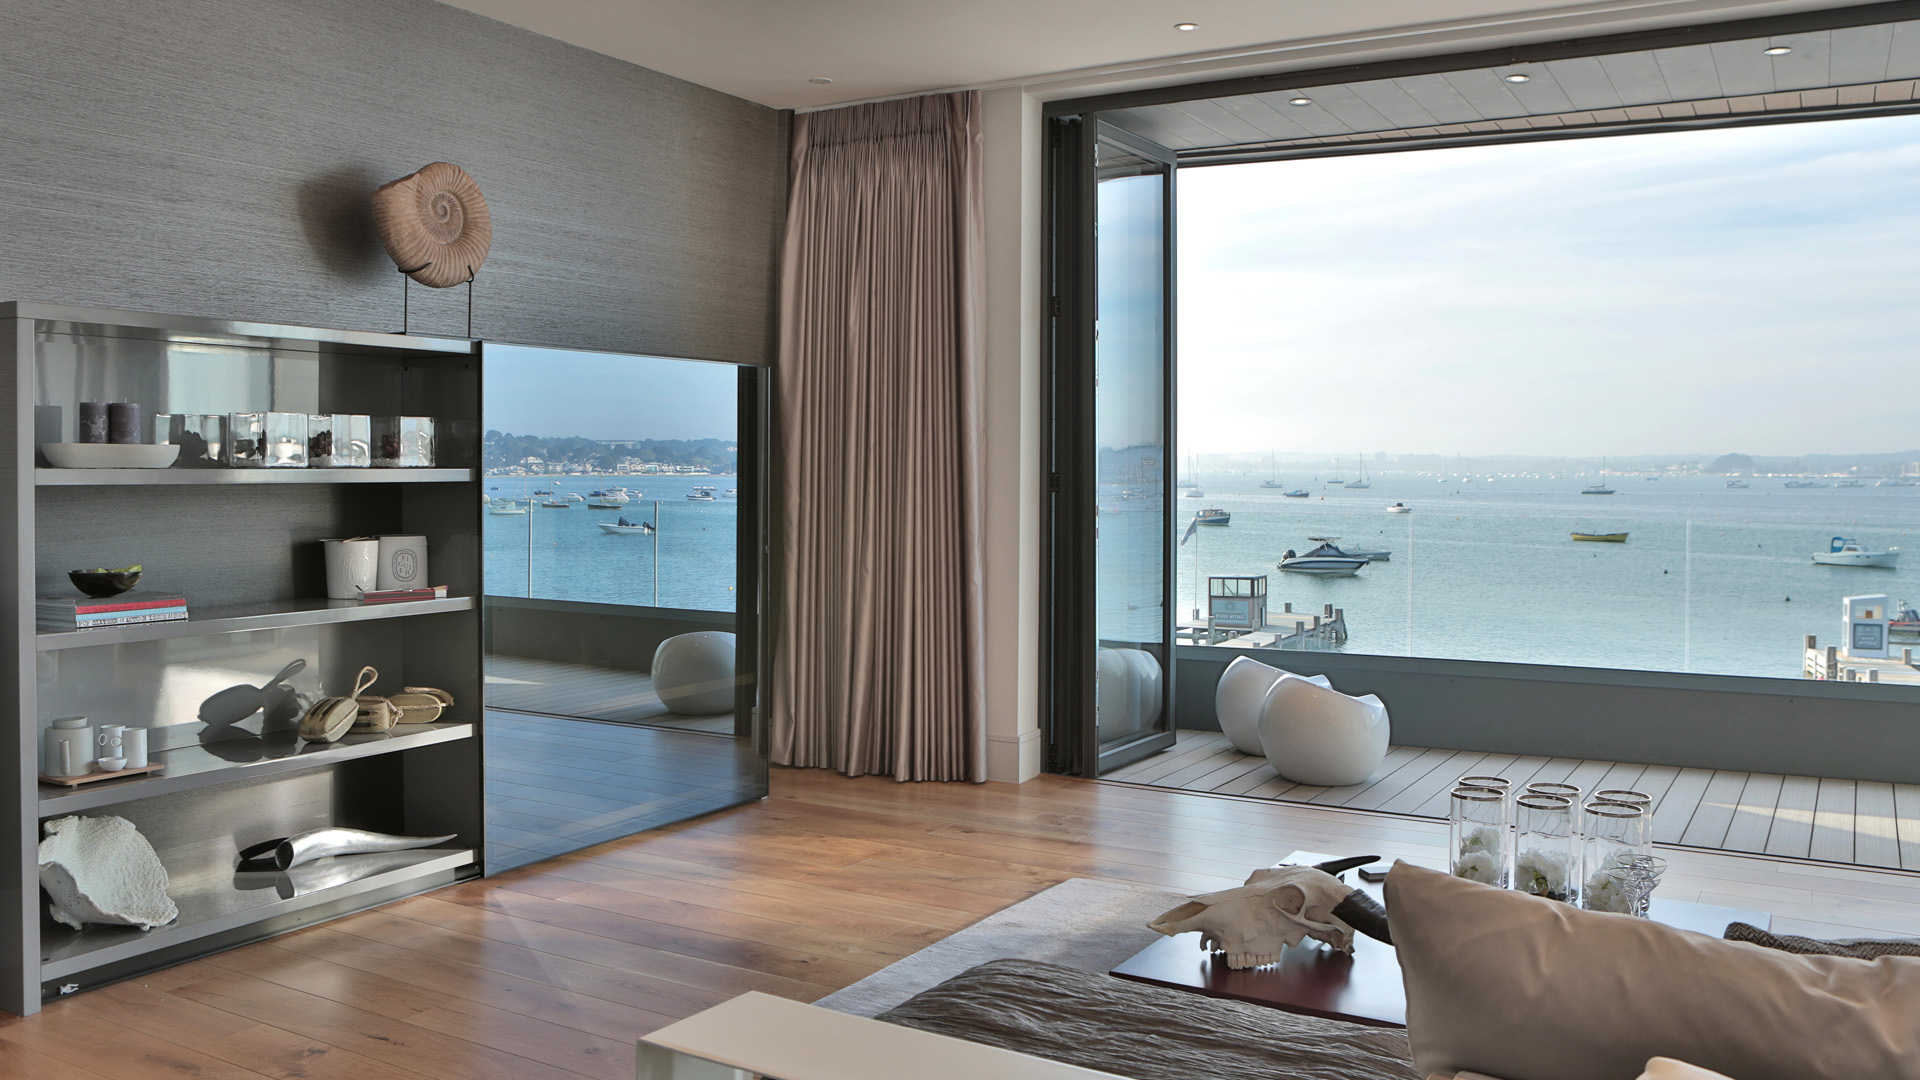 Bioko studio i digital design i photography i moving image for Digital home designs